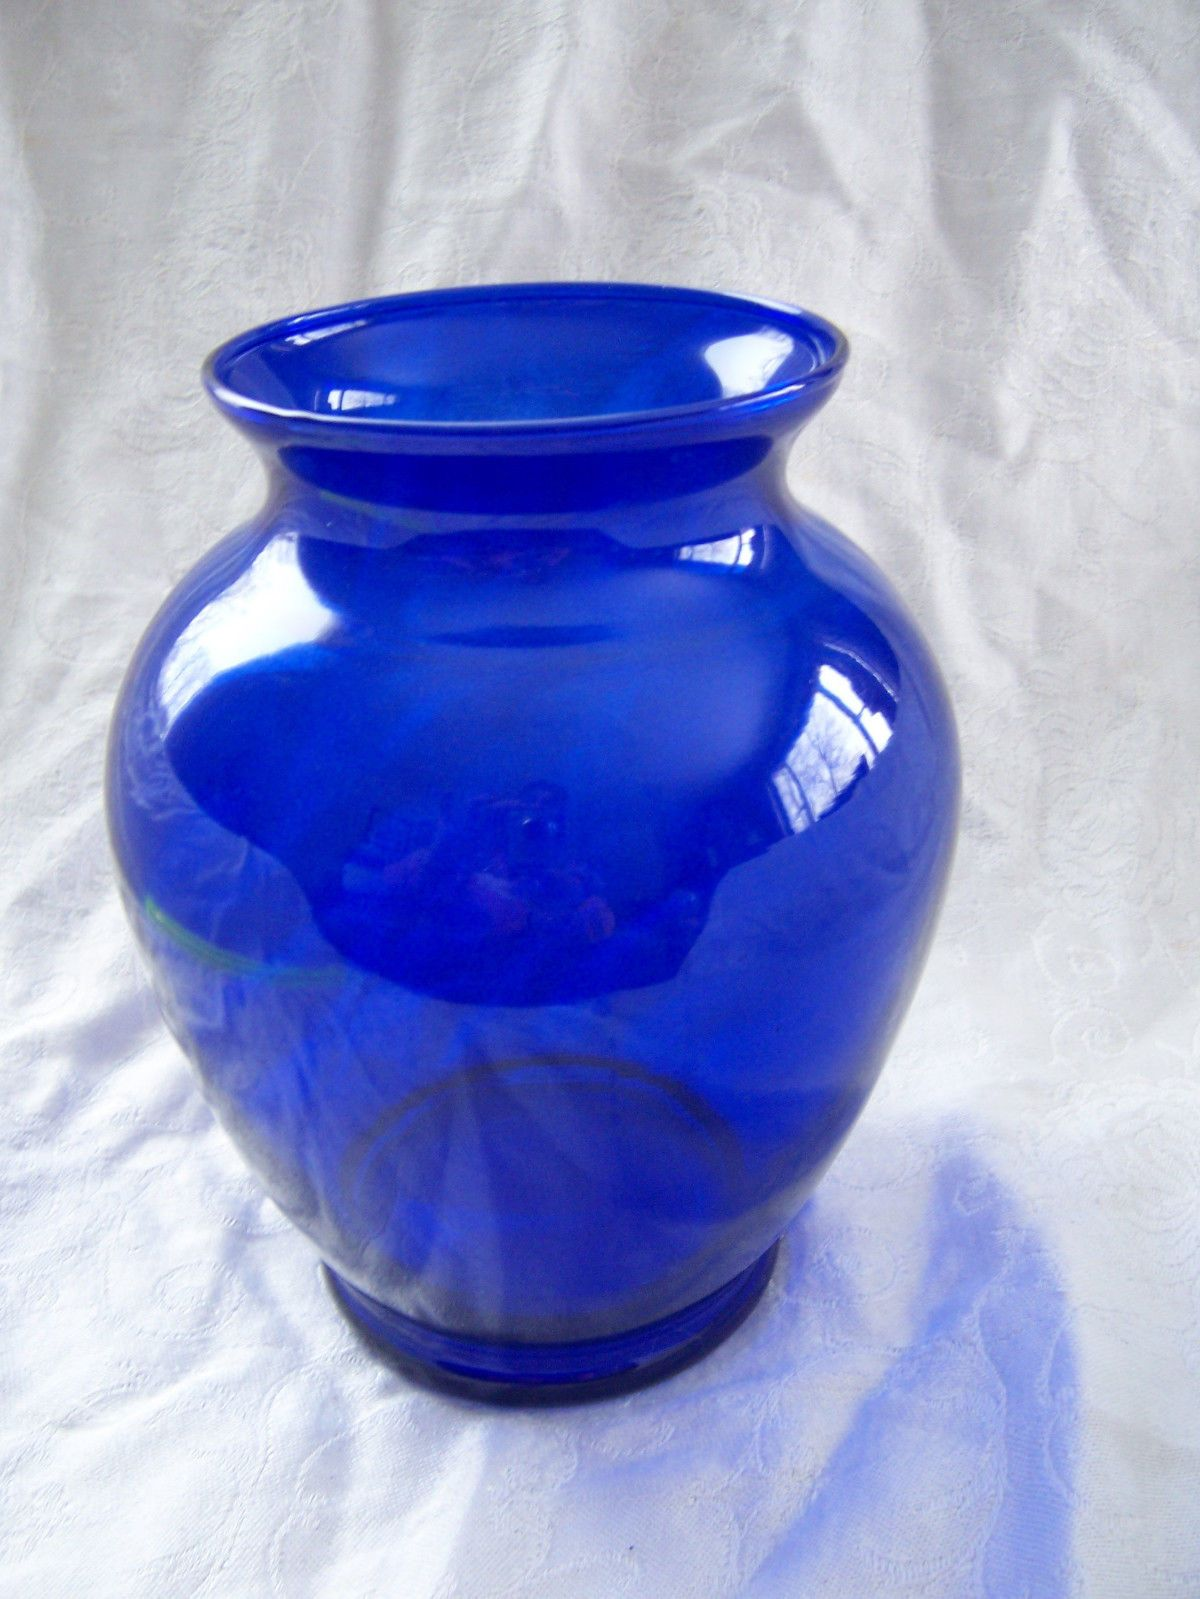 Vintage deep cobalt blue glass hobnail flower vase made usa 1 1940 cobalt glass vase deep blue flared top wide middle heavy glass deep blue hue 8 floridaeventfo Image collections